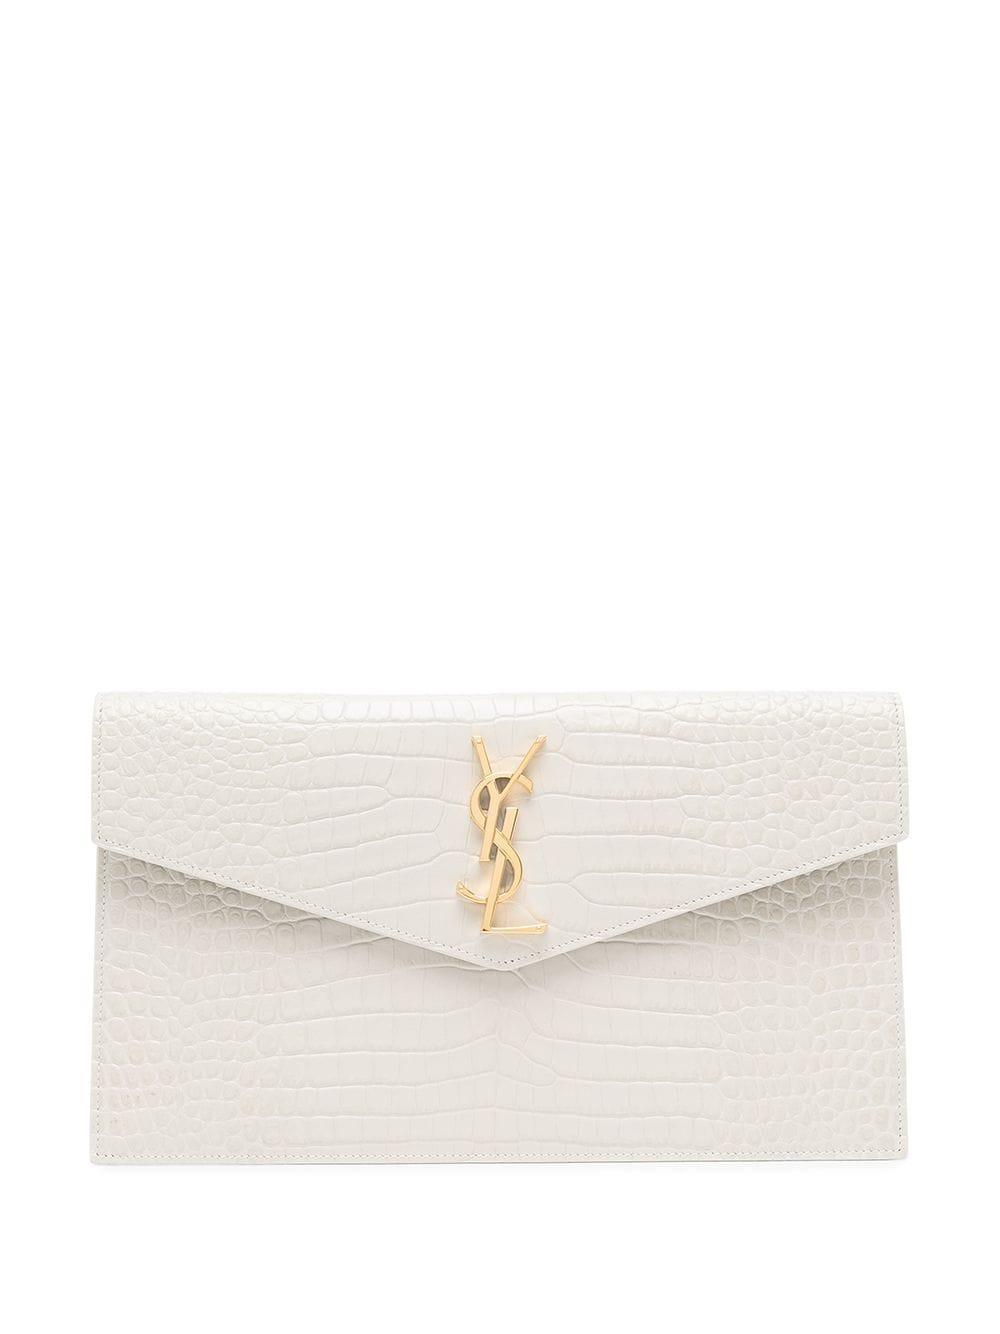 Medium Croc- Embossed Envelope Pouch Item # 565739DND0J